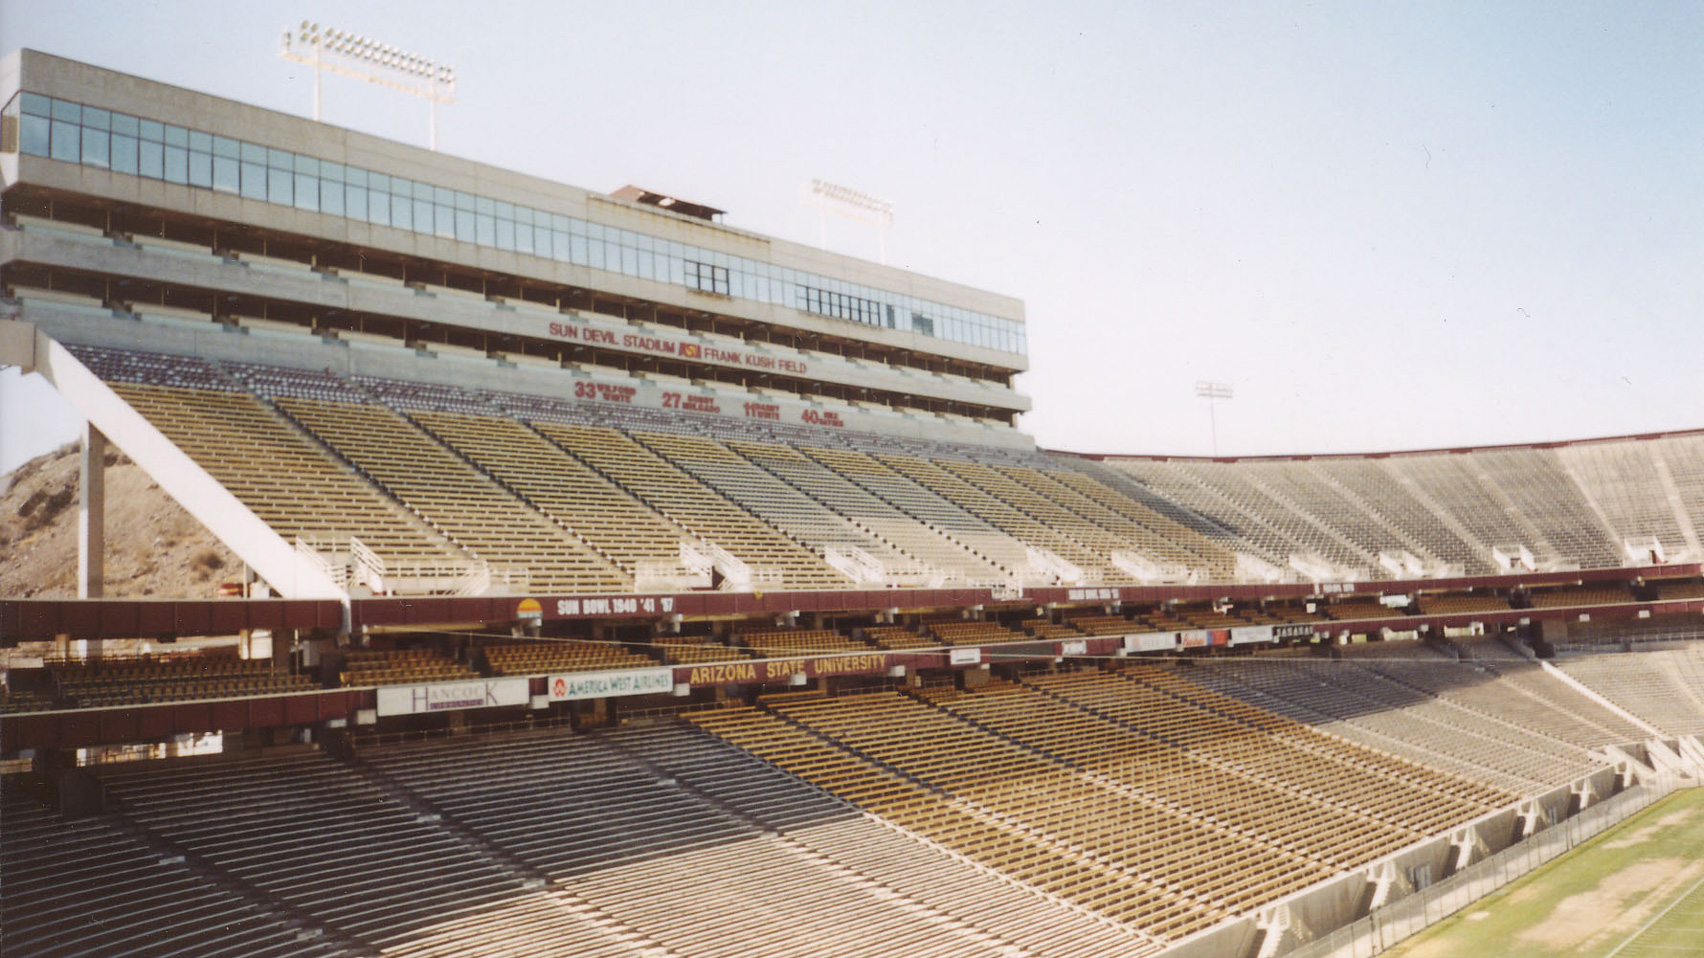 Sun Devil Stadium by Edward L Varney, Tempe, Arizona